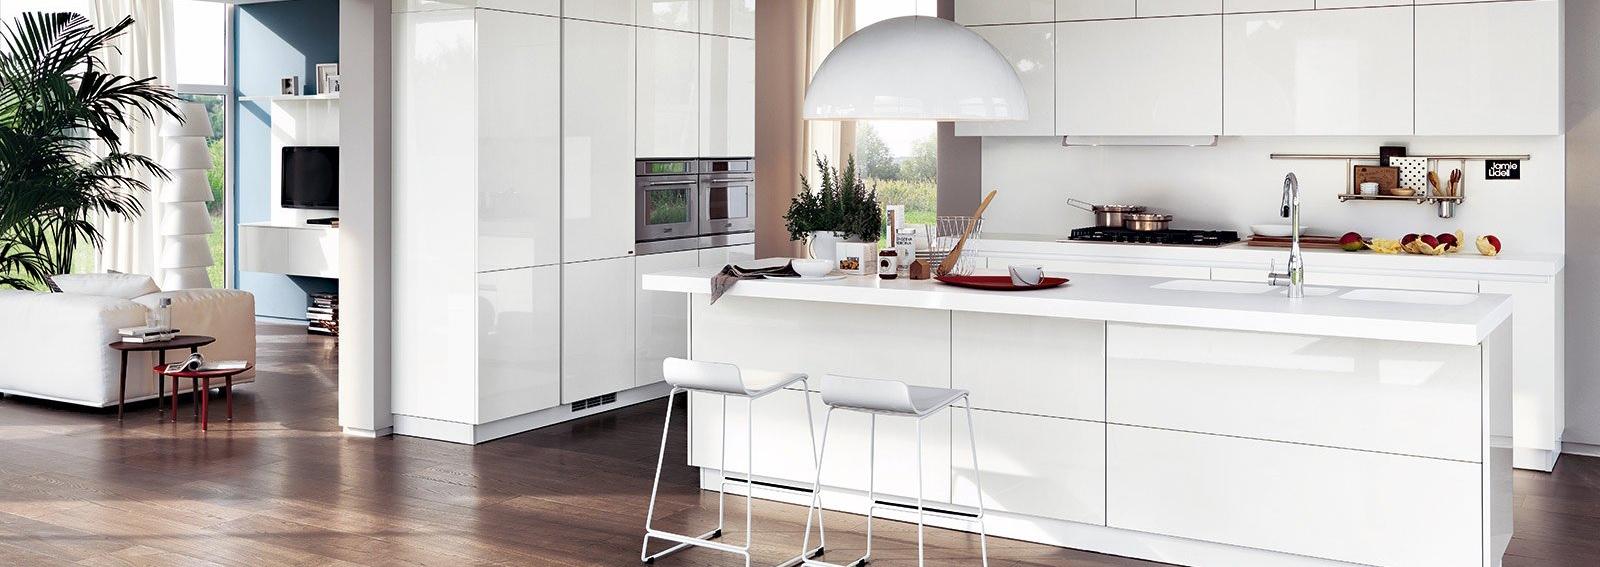 cover-ravvivare-cucina-bianca-desktop